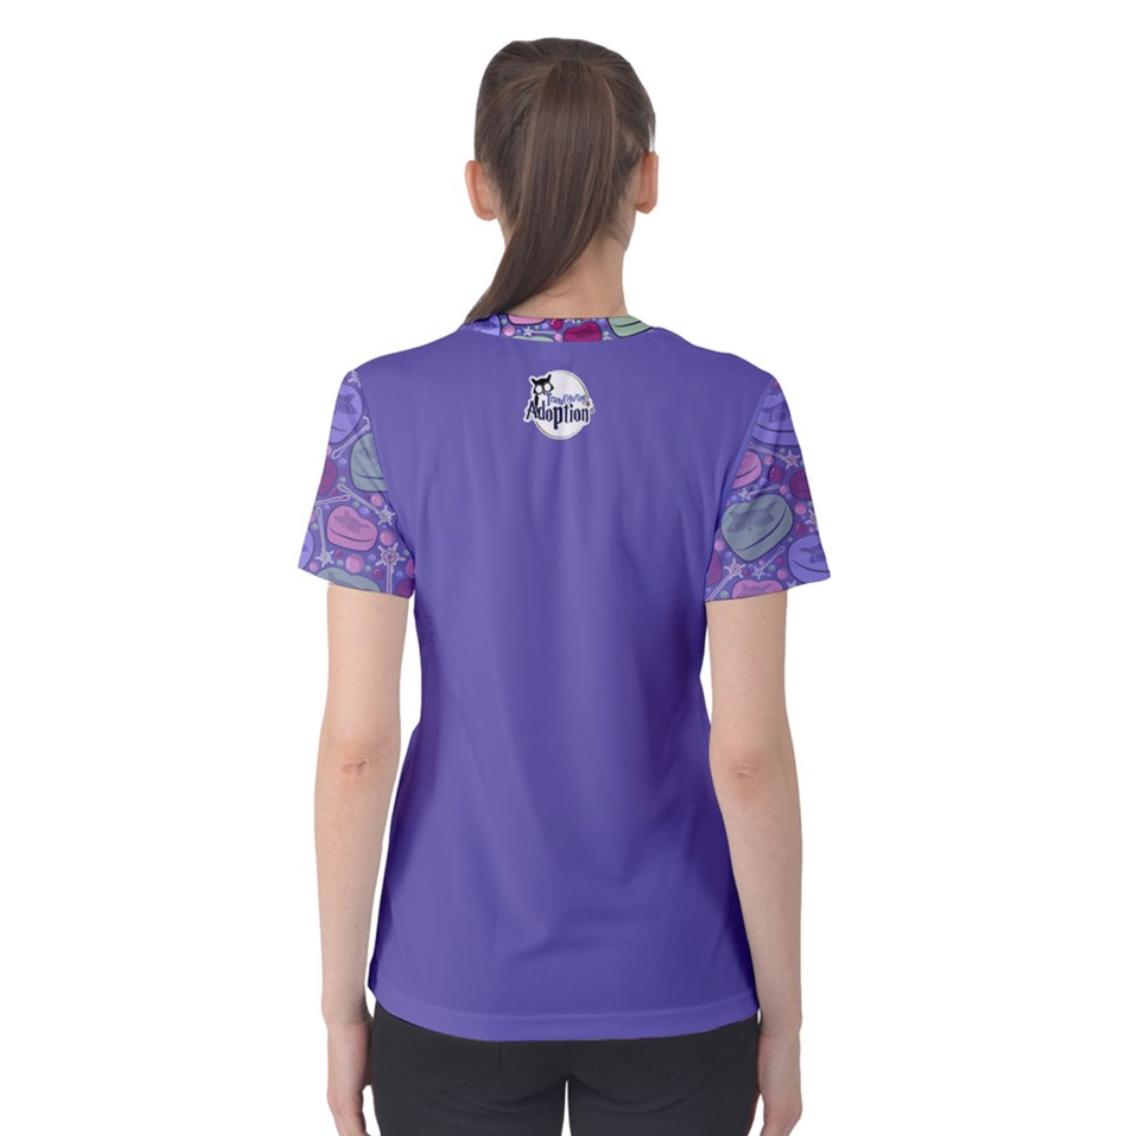 Charmed Women's Cotton Tee (Purple Solid Body)